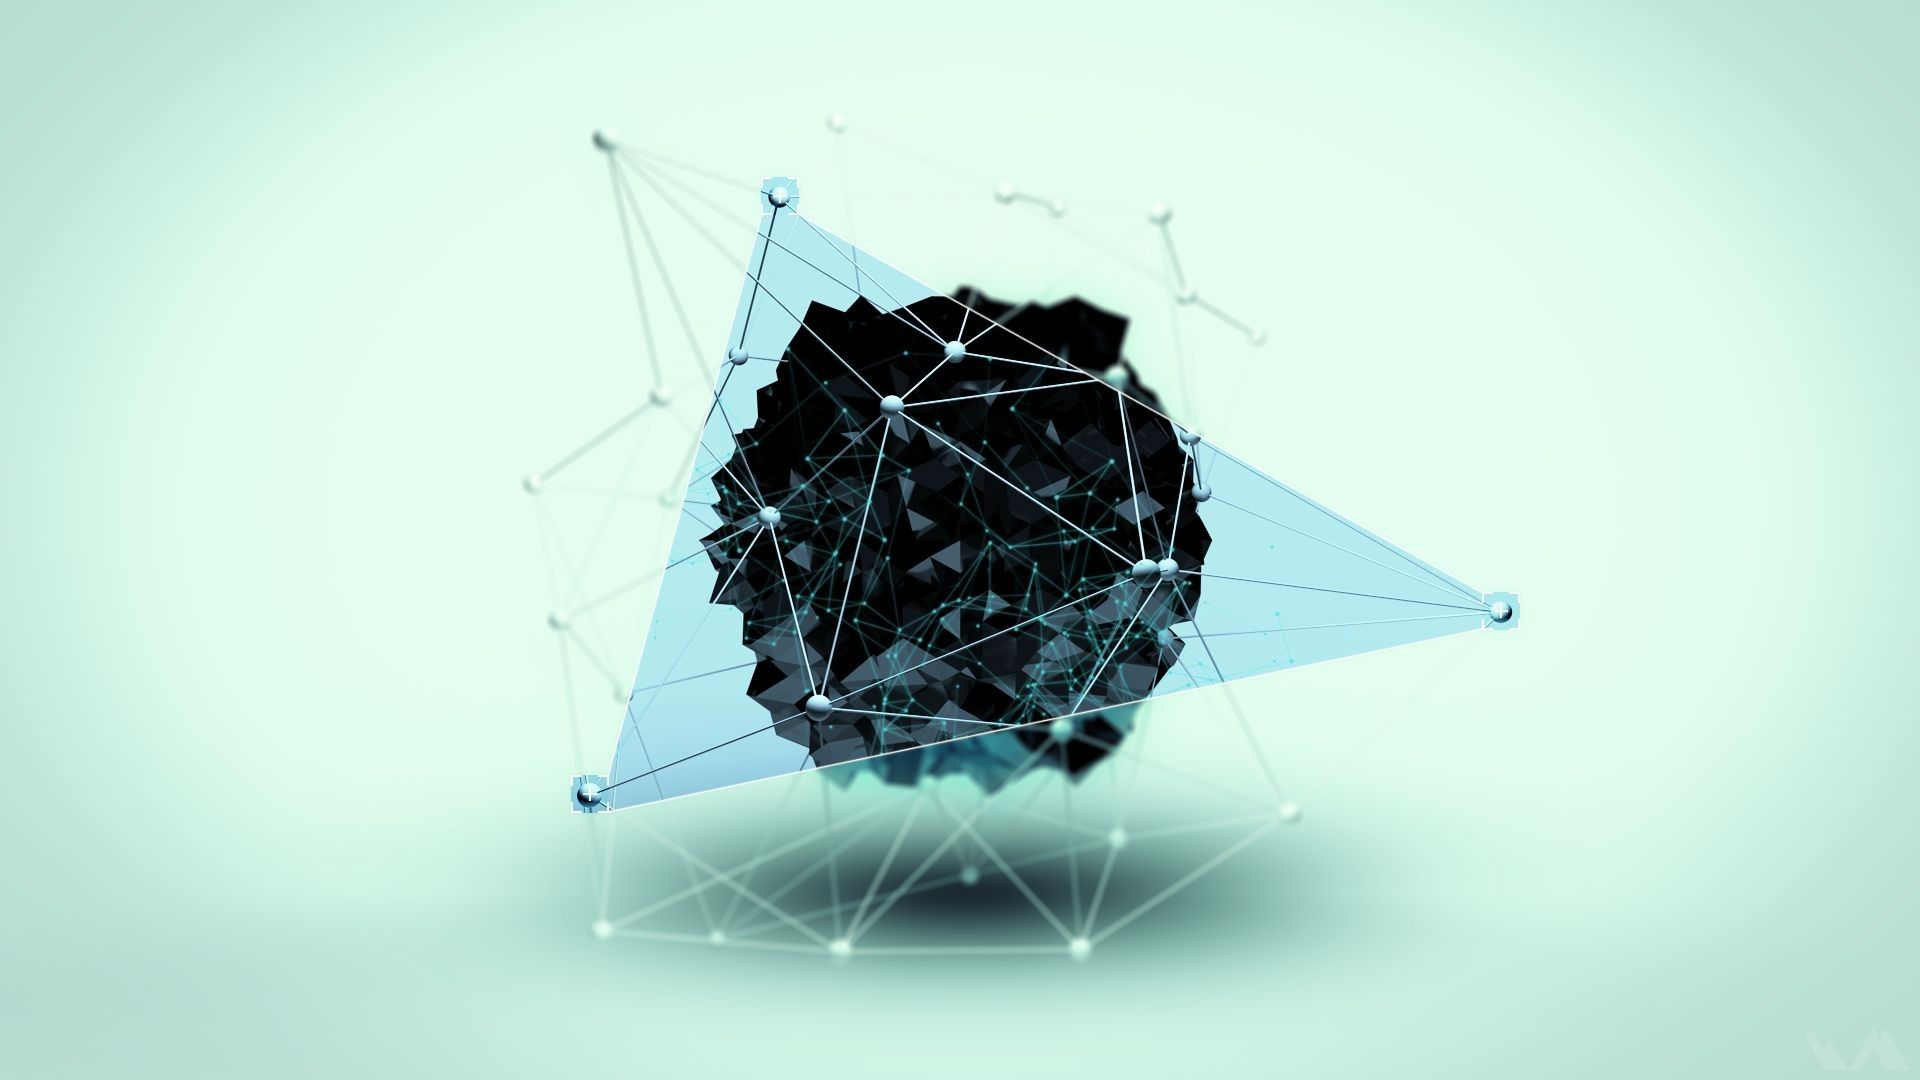 geometry digital art shapes hd wallpaper fullhdwpp full hd  in